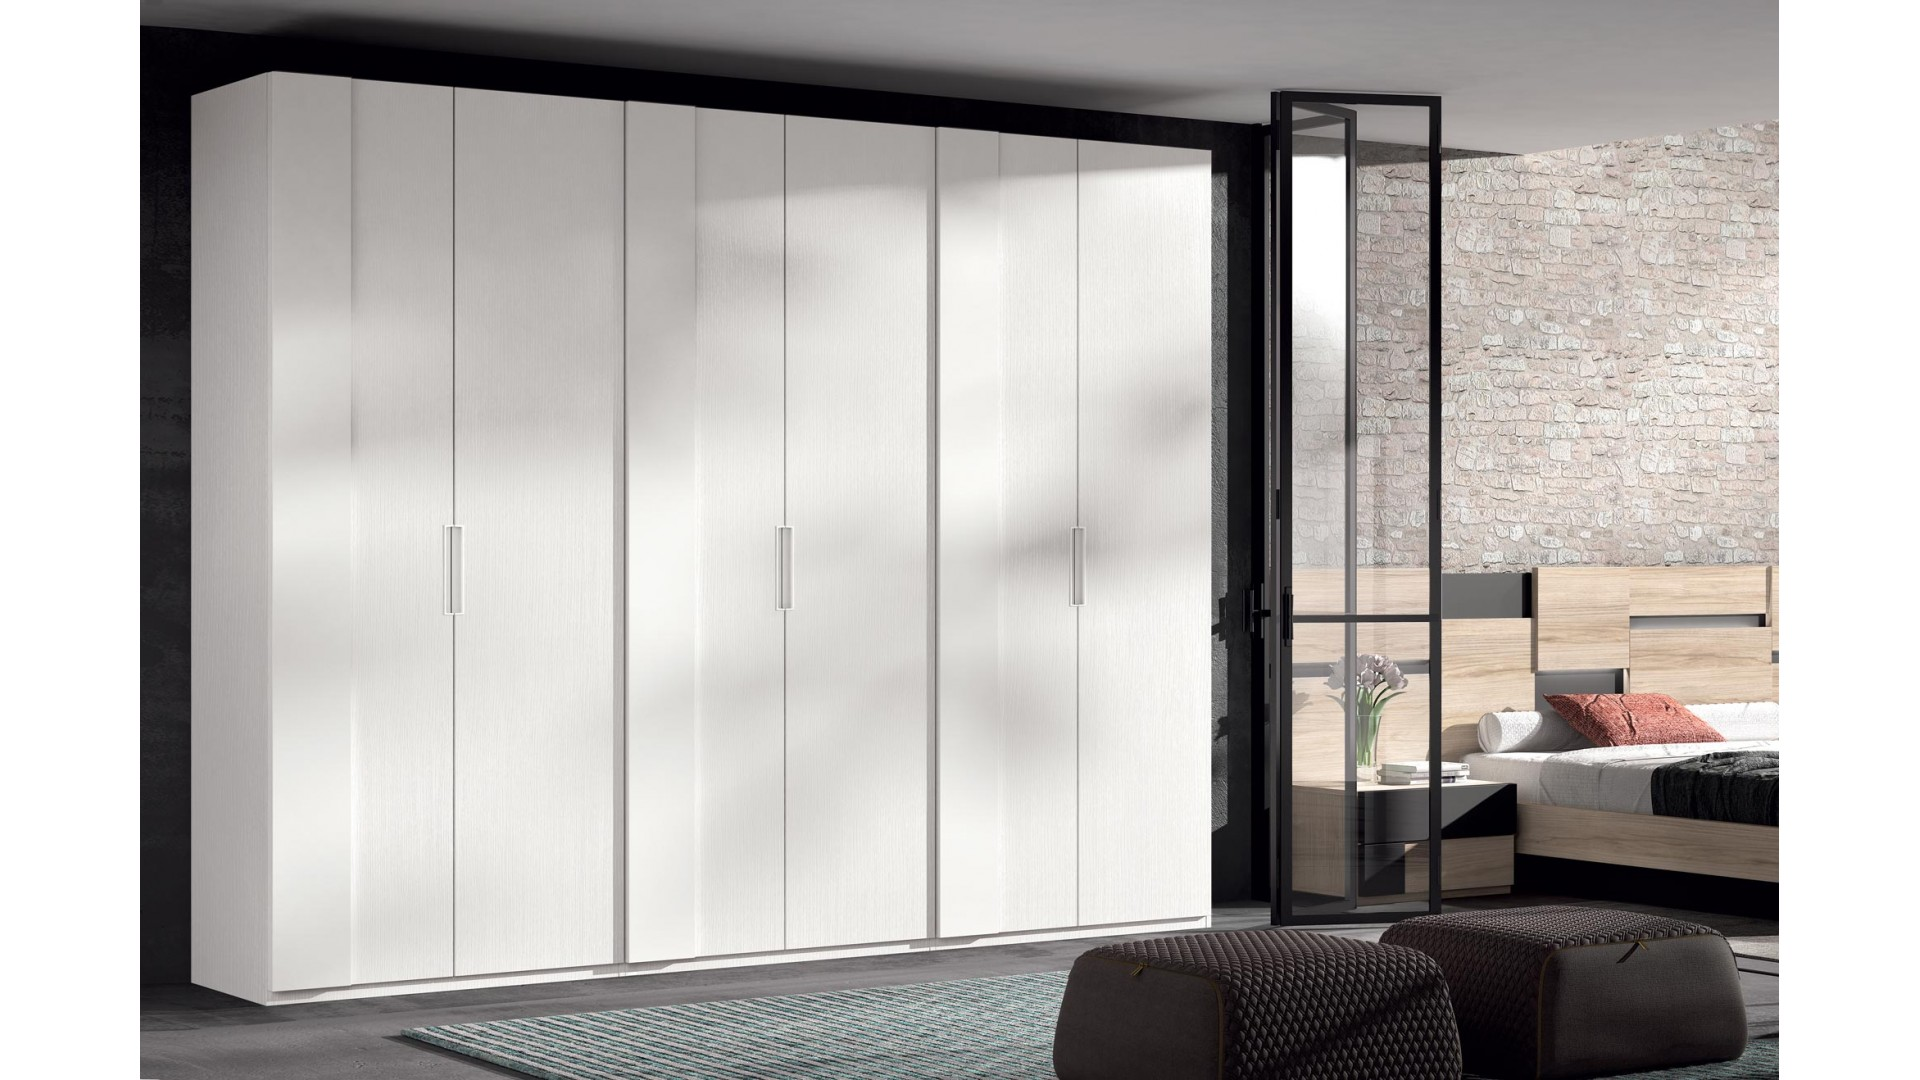 Armoire dressing portes battantes PERSONNALISABLE COSMO49 - GLICERIO